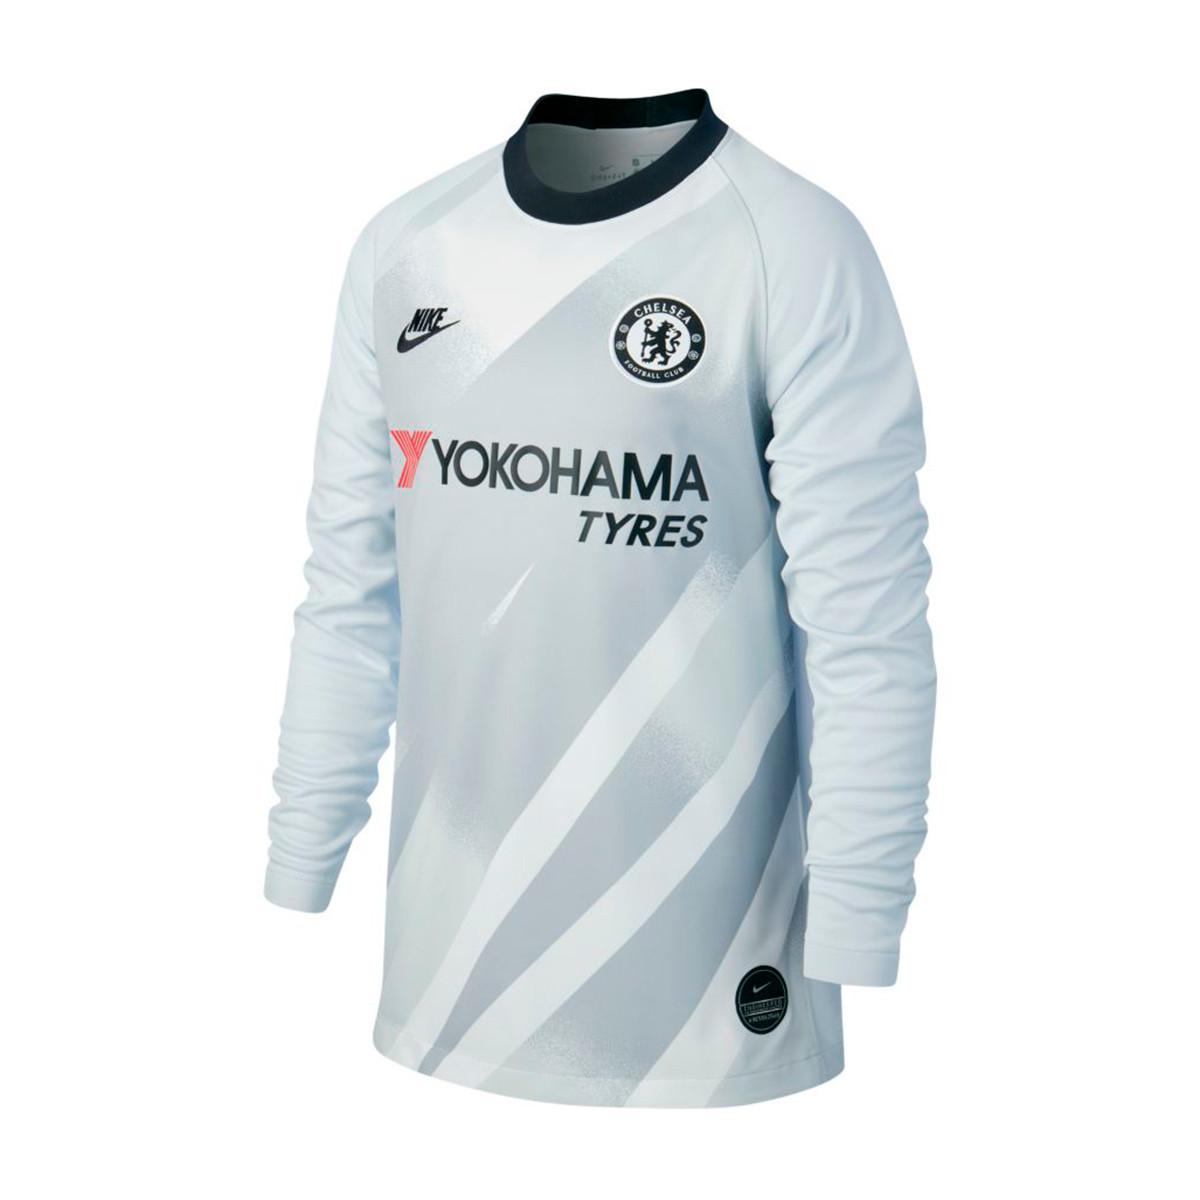 los angeles b2a51 bcd8a Camiseta Chelsea FC Breathe Stadium Portero 2019-2020 Niño CL Pure  platinum-Black